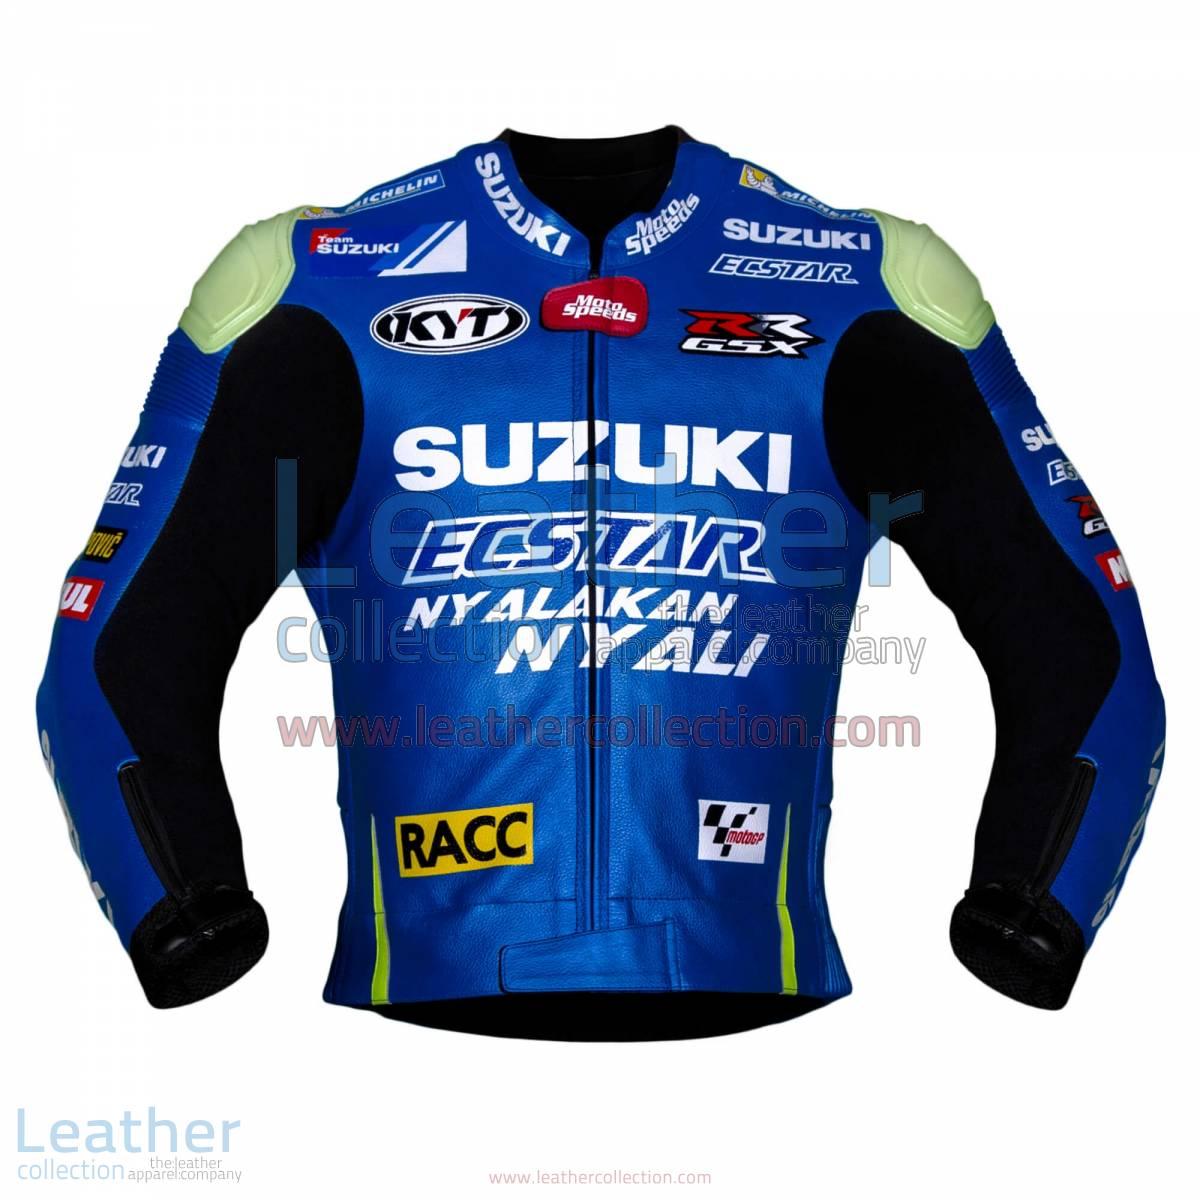 Aleix Espargaro Suzuki 2016 MotoGP Racing Jacket | Aleix Espargaro Suzuki 2016 MotoGP Racing Jacket